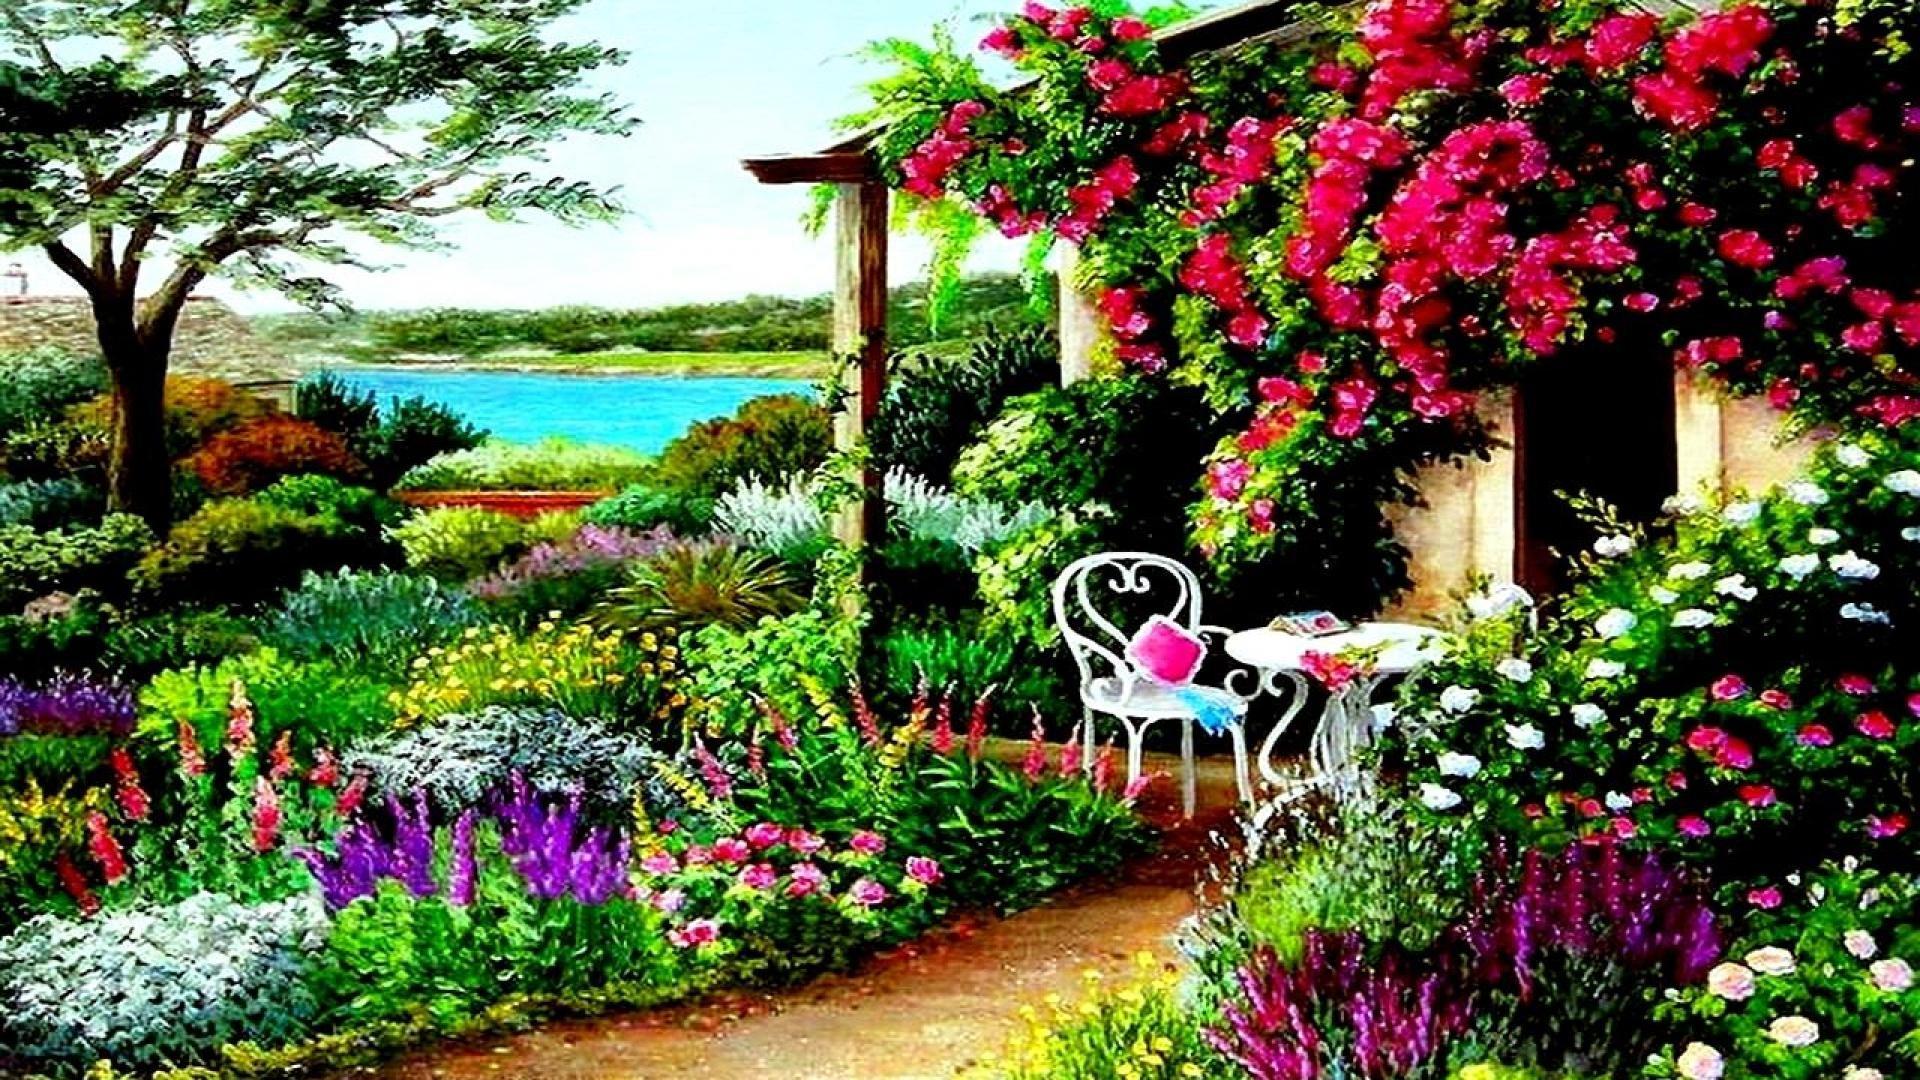 Res: 1920x1080, Spring Garden Desktop Wallpapers ~ Toptenpack.com